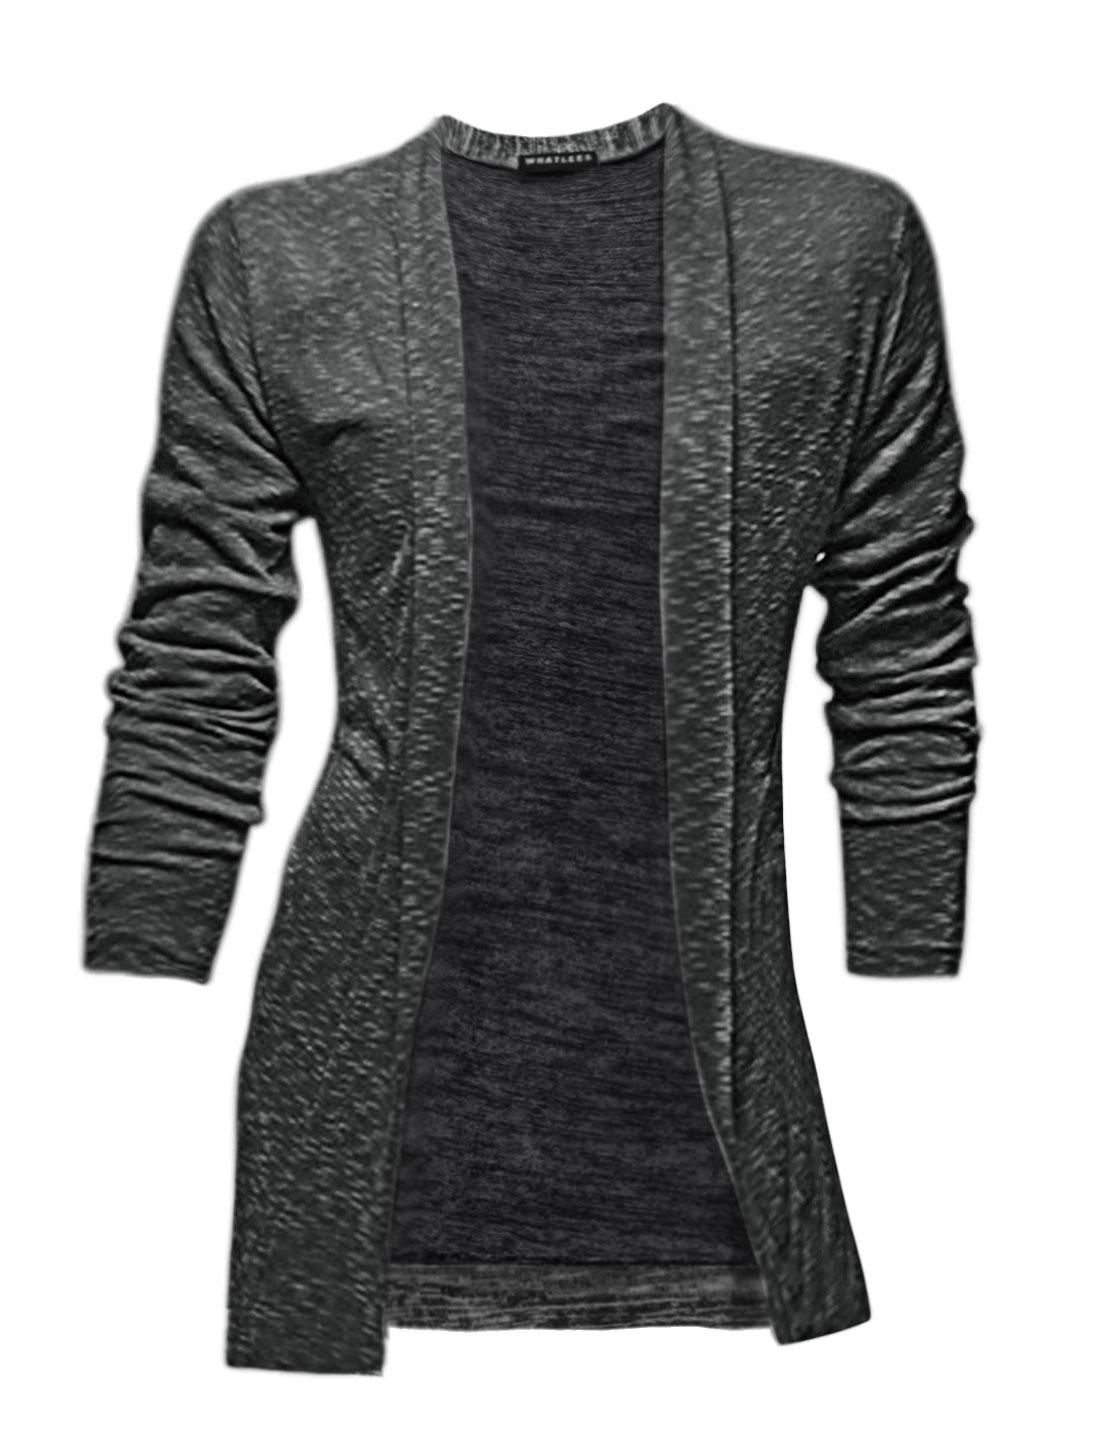 Man Long Sleeves Front Opening Shawl Collar Tunic Cardigan Black M